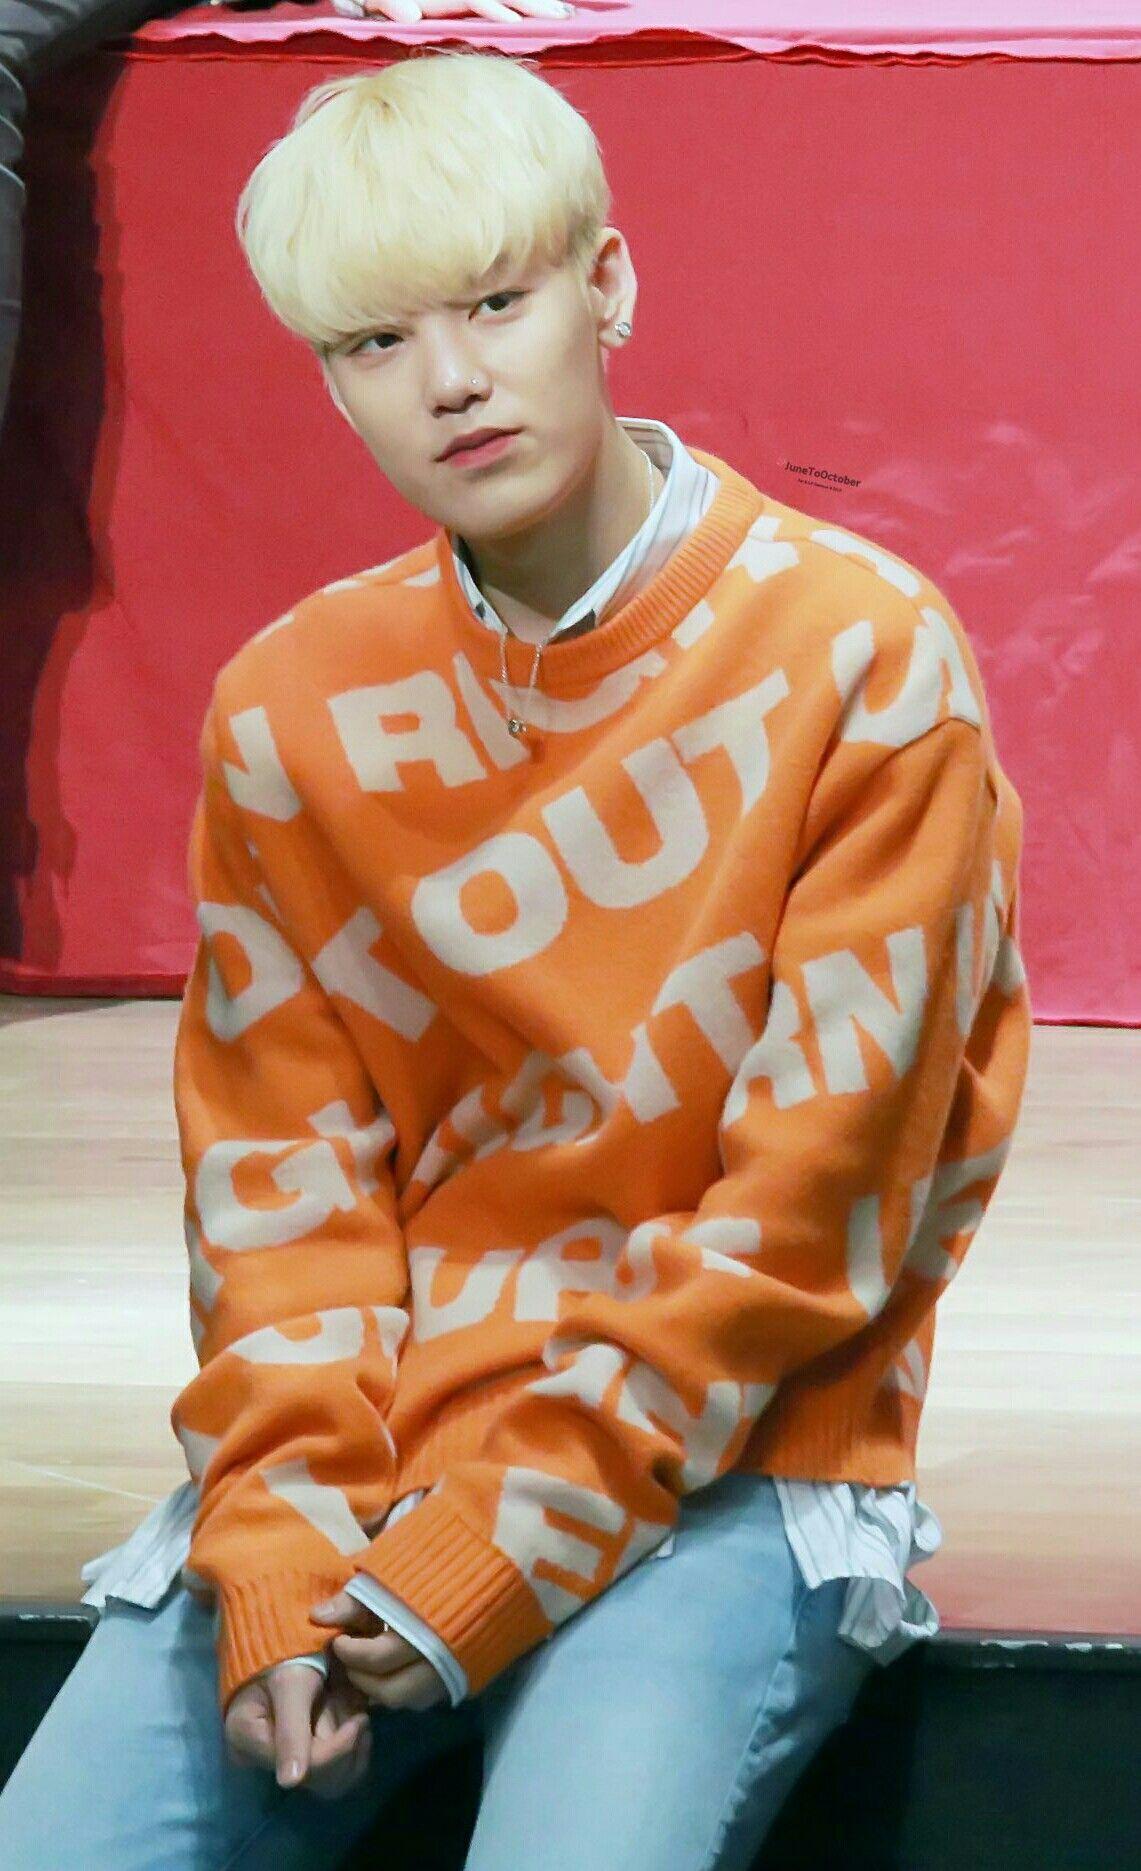 He looks like an orange marshmallow. He is forever a giant baby #Zelo #Choijunhong #BAP #Kpop #orangeshirt #blonde #giantbaby #maknae #cute #marshmallow #suwon #fansign #171230 #seoul #ego #handsup #album #8thsingle #prettyboy #handsomeboy #model #handsome #stillgrowing